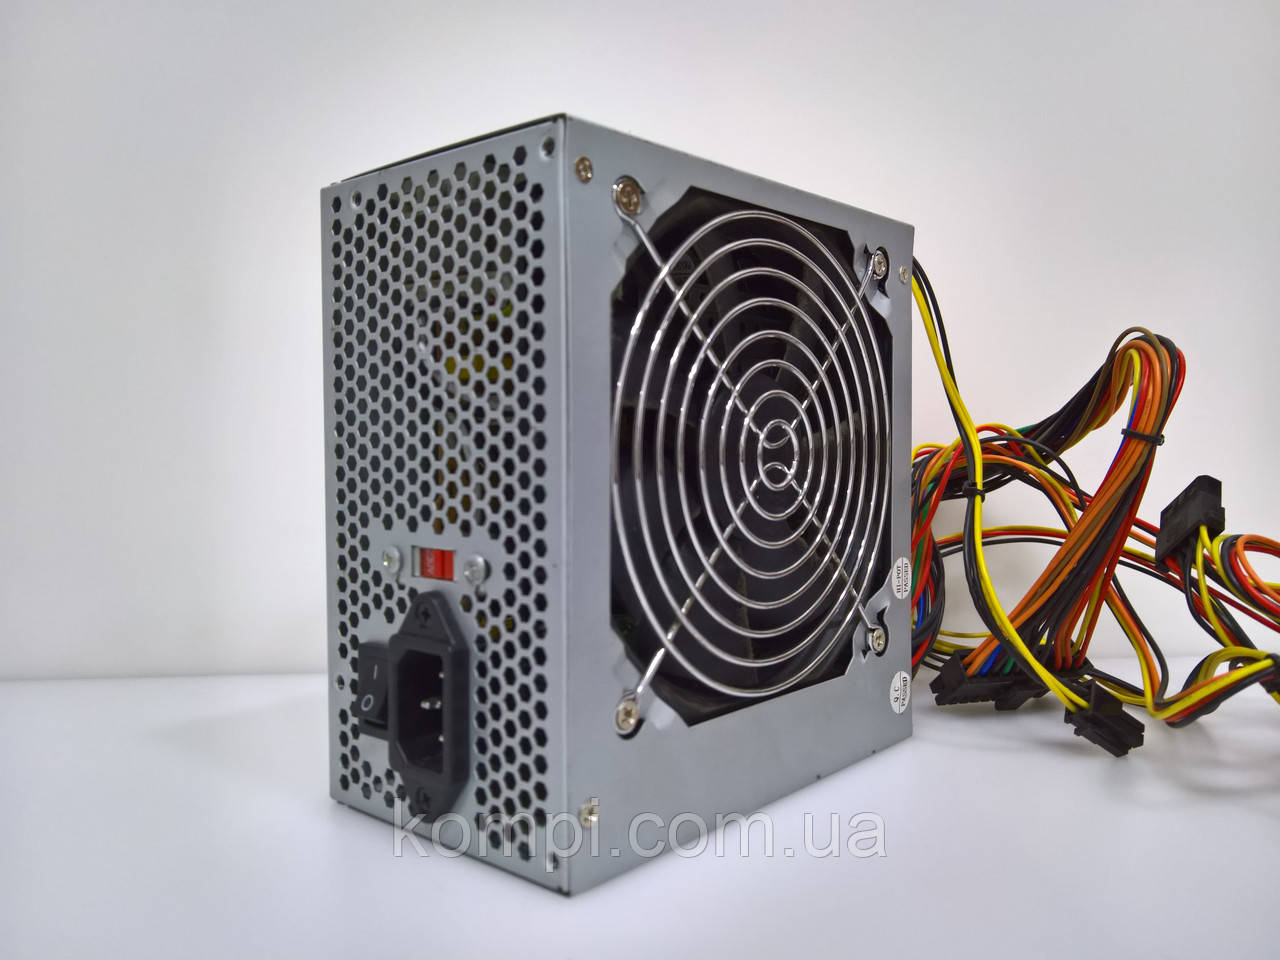 Блок питания 450W MS-Tech MS-N450-SYS б/у